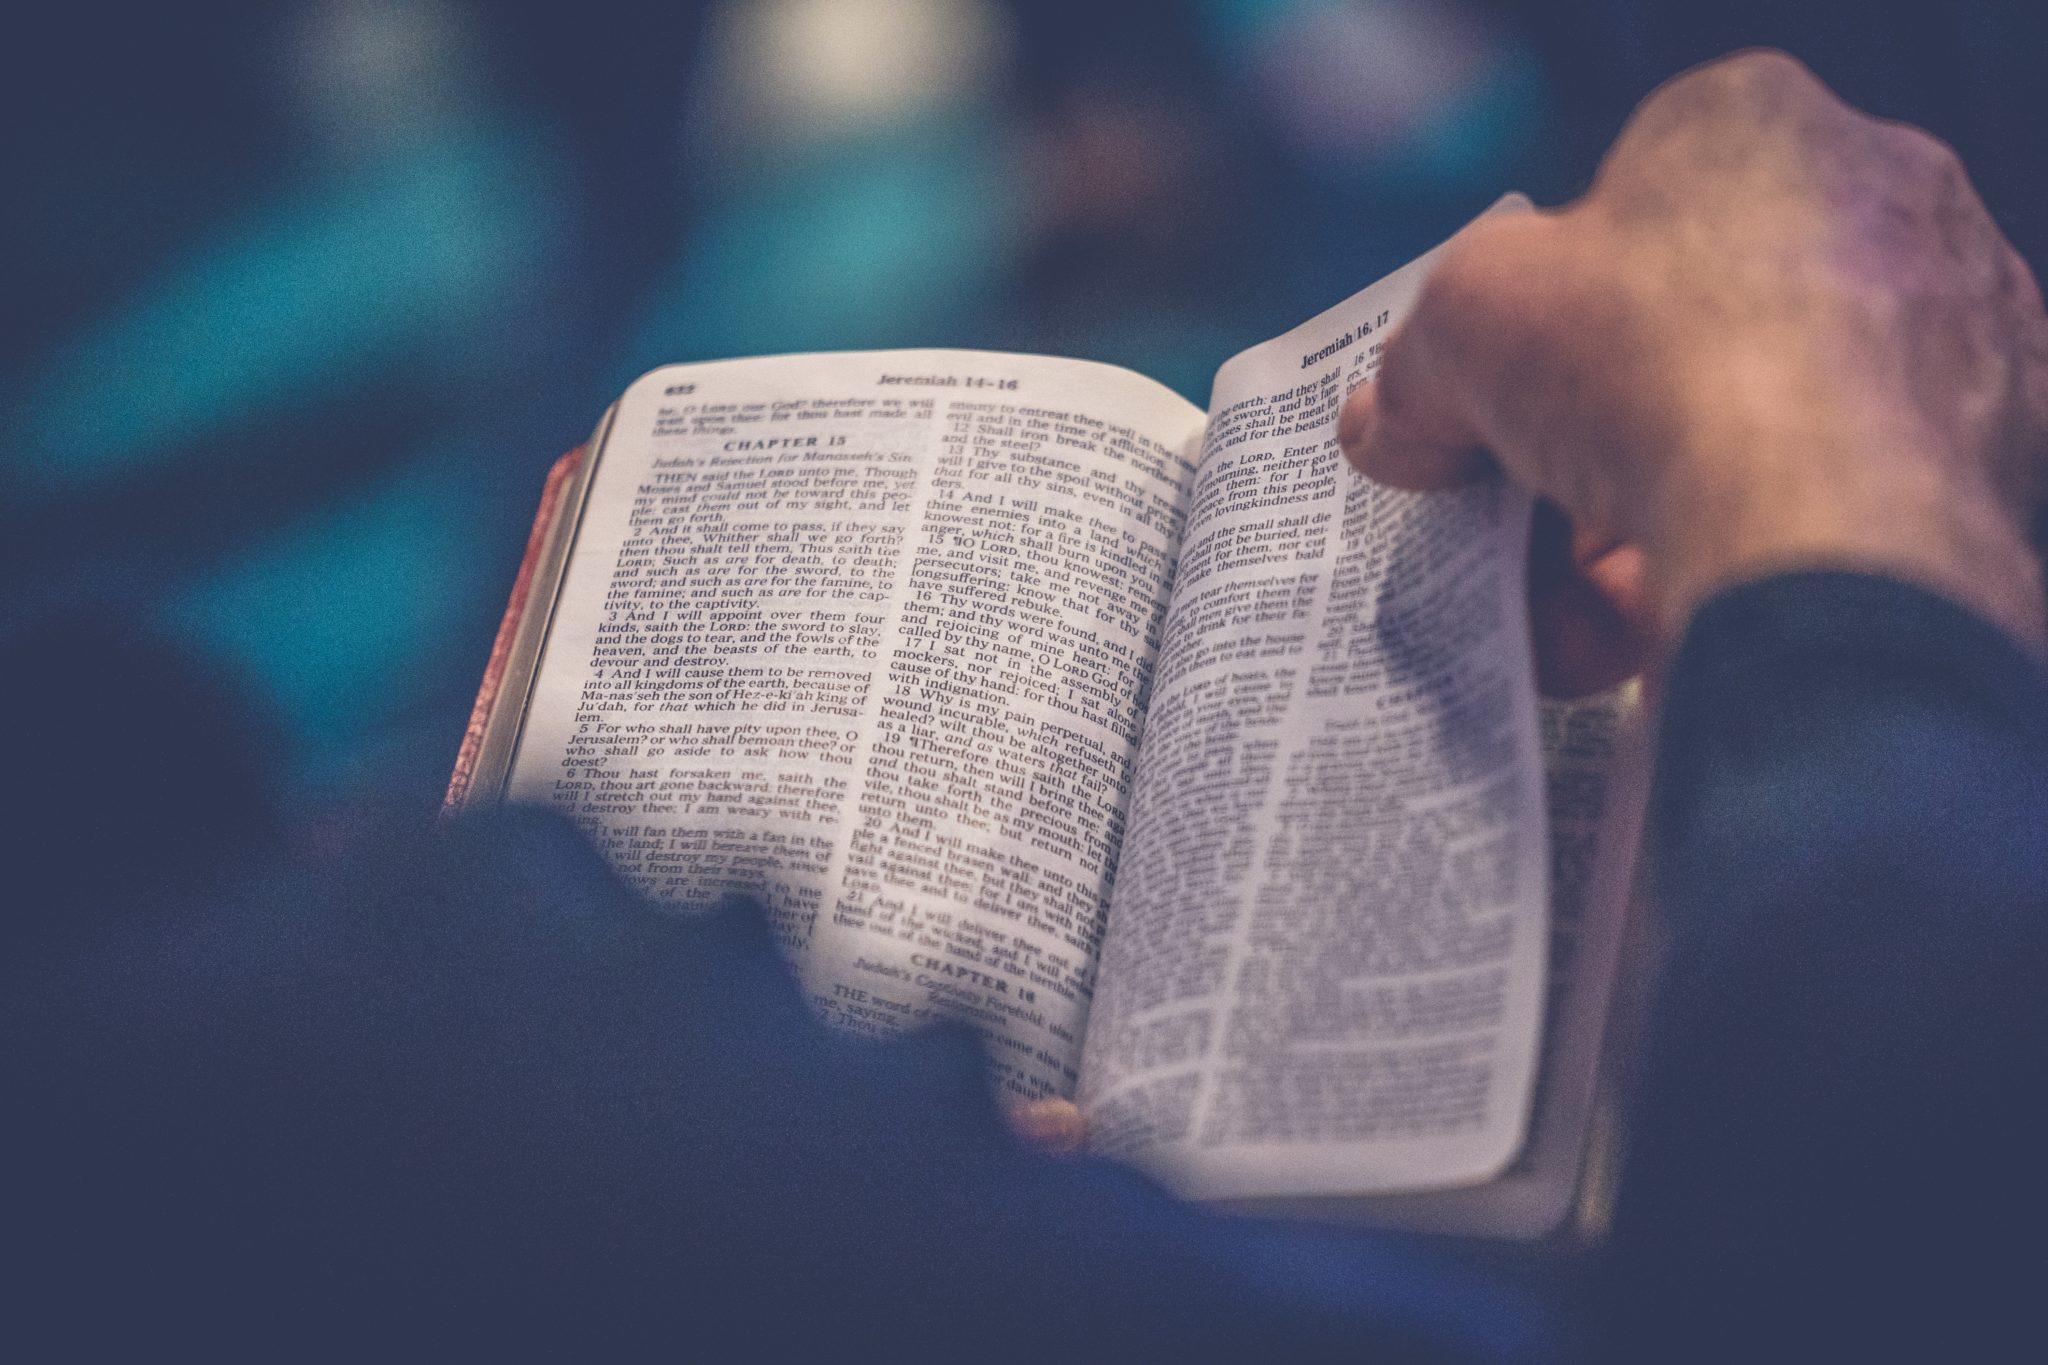 Lectio Divina: An Ancient Contemplative Spiritual Practice